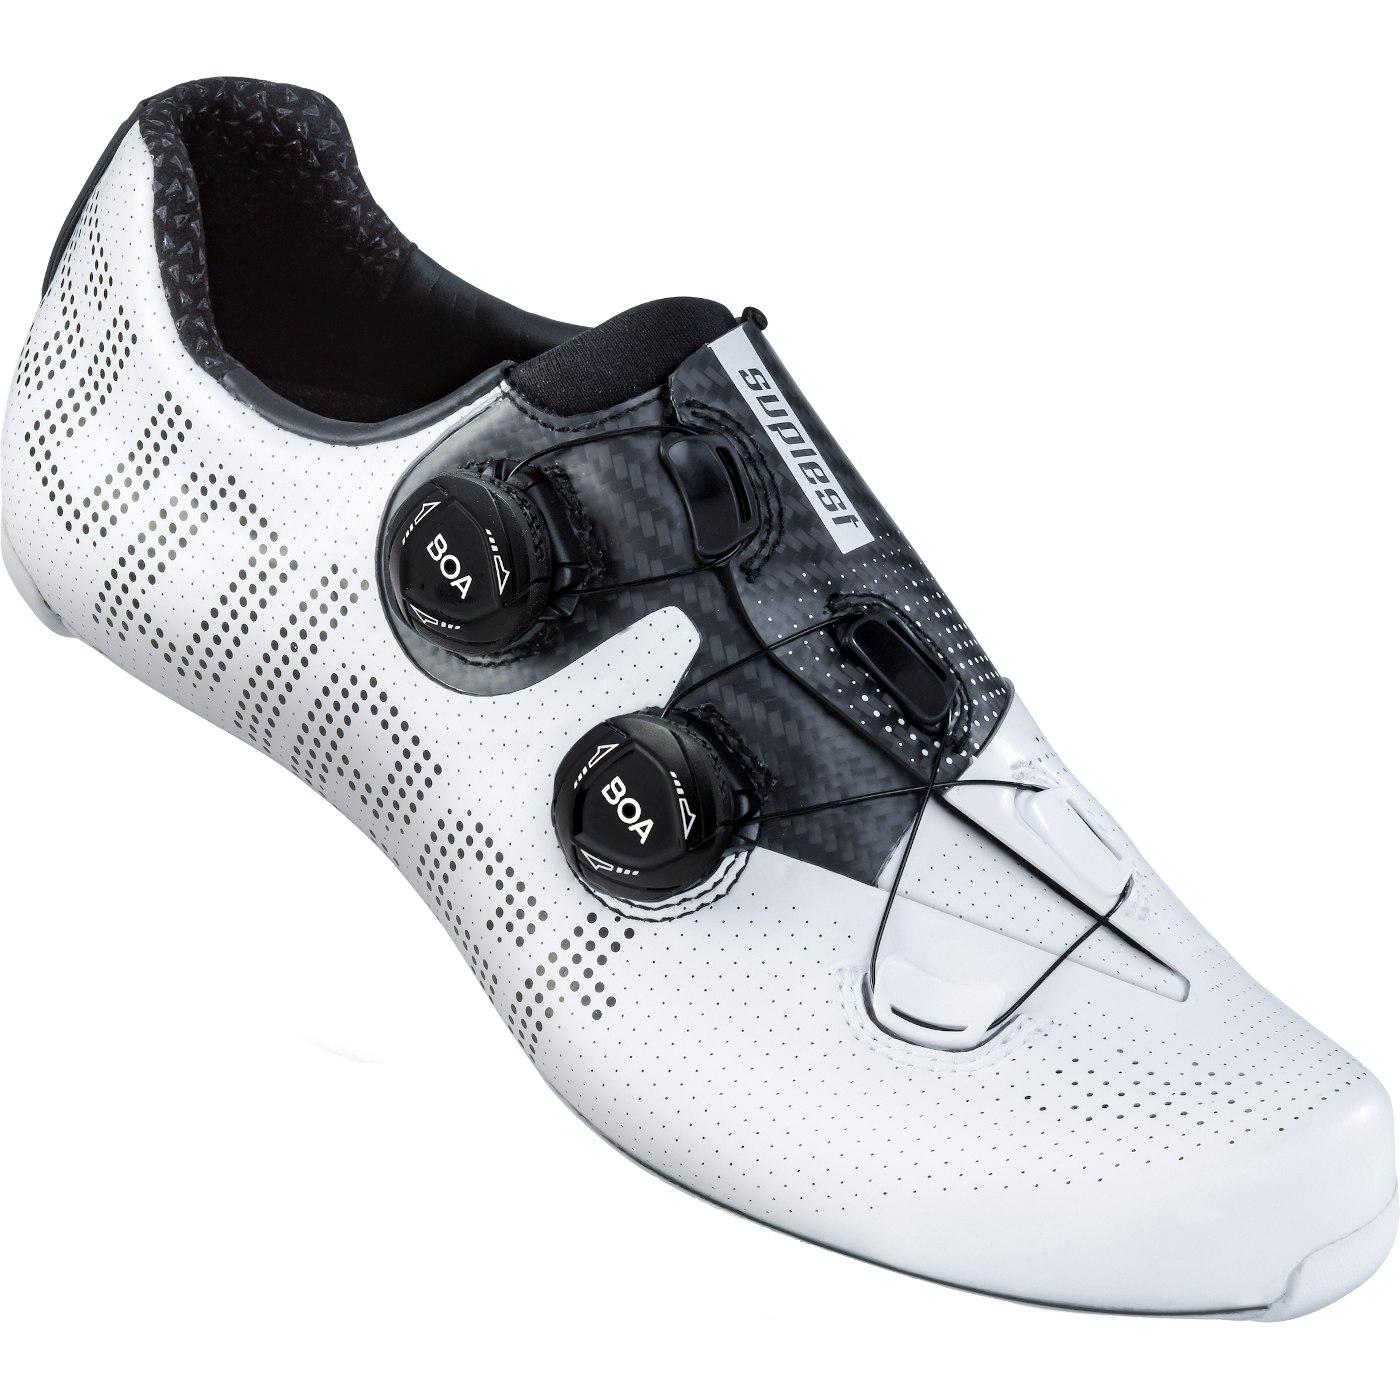 Suplest EDGE+ Double BOA IP1 Road Pro Shoe - White / Black 01.062.